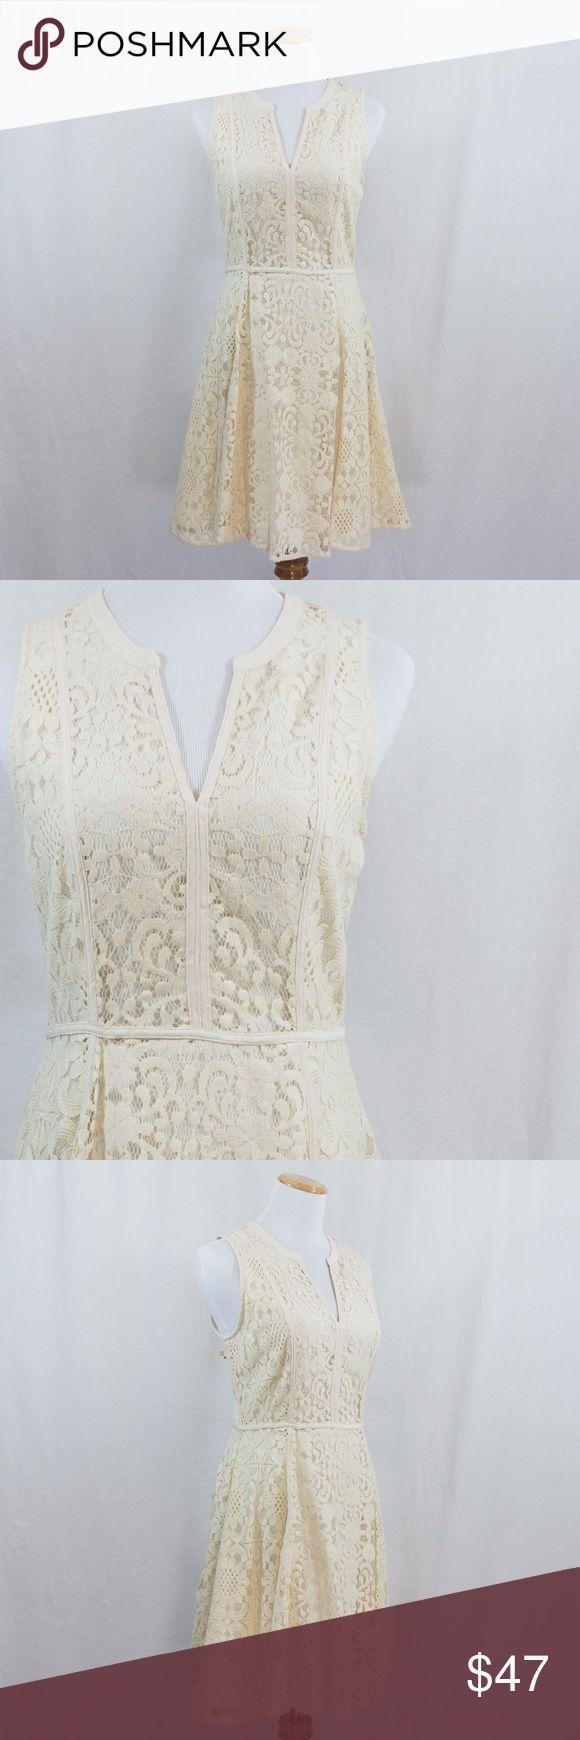 "Lace Dress NWT Brand new cream lace dress. Hidden side zipper. Fully lined. B 18.5""; W 29""; L 37"". LC Lauren Conrad Dresses"